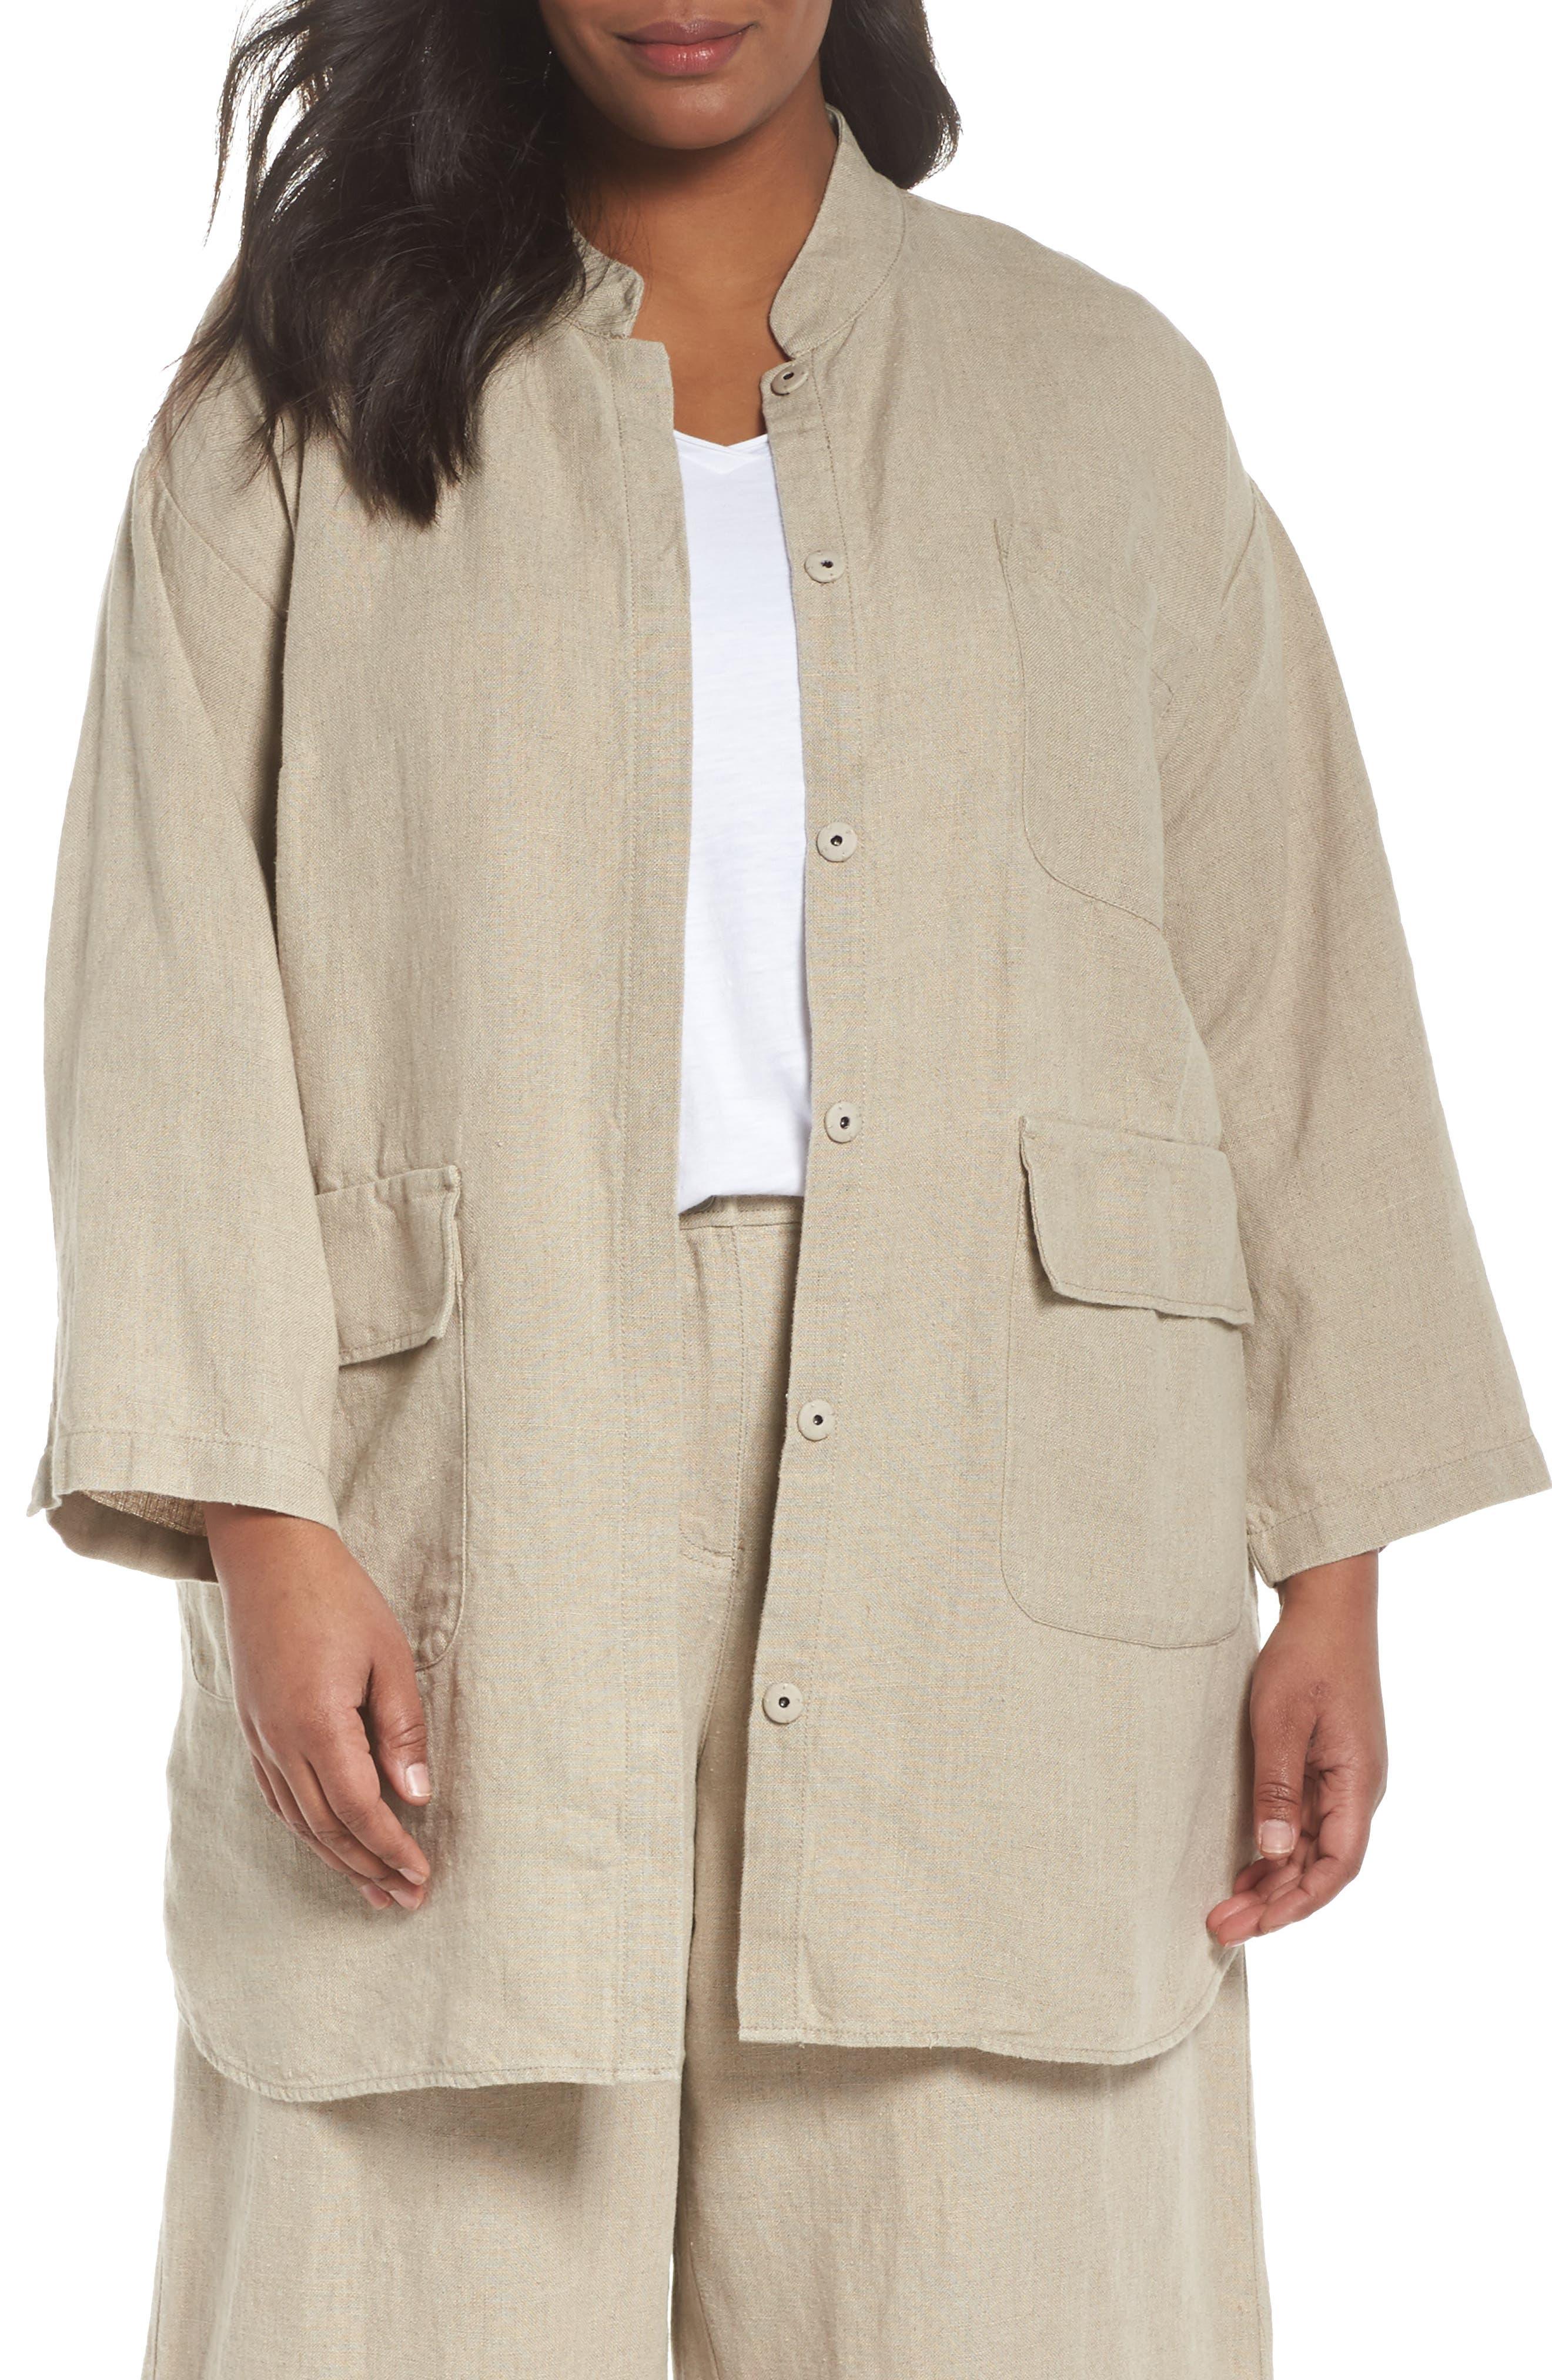 Organic Linen Jacket,                             Main thumbnail 1, color,                             251